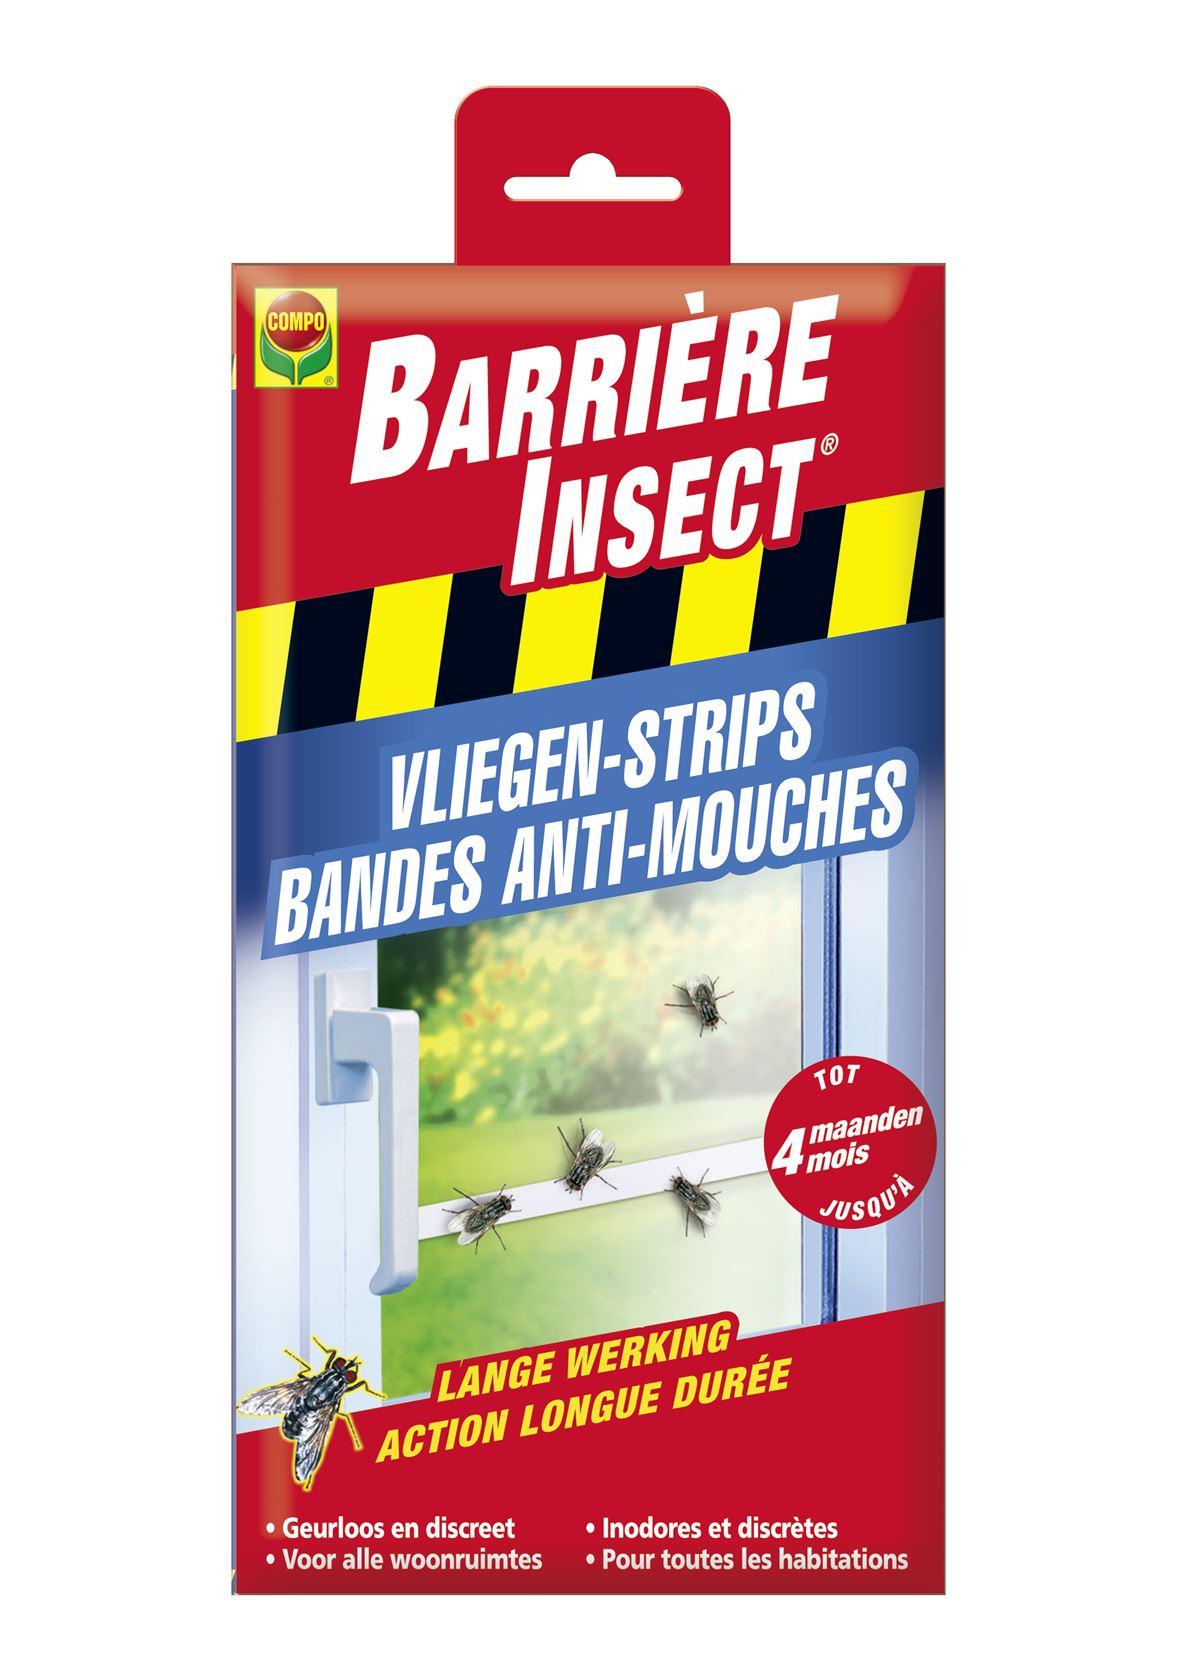 Barrière insect  vliegen-strips - 2x6 stuks